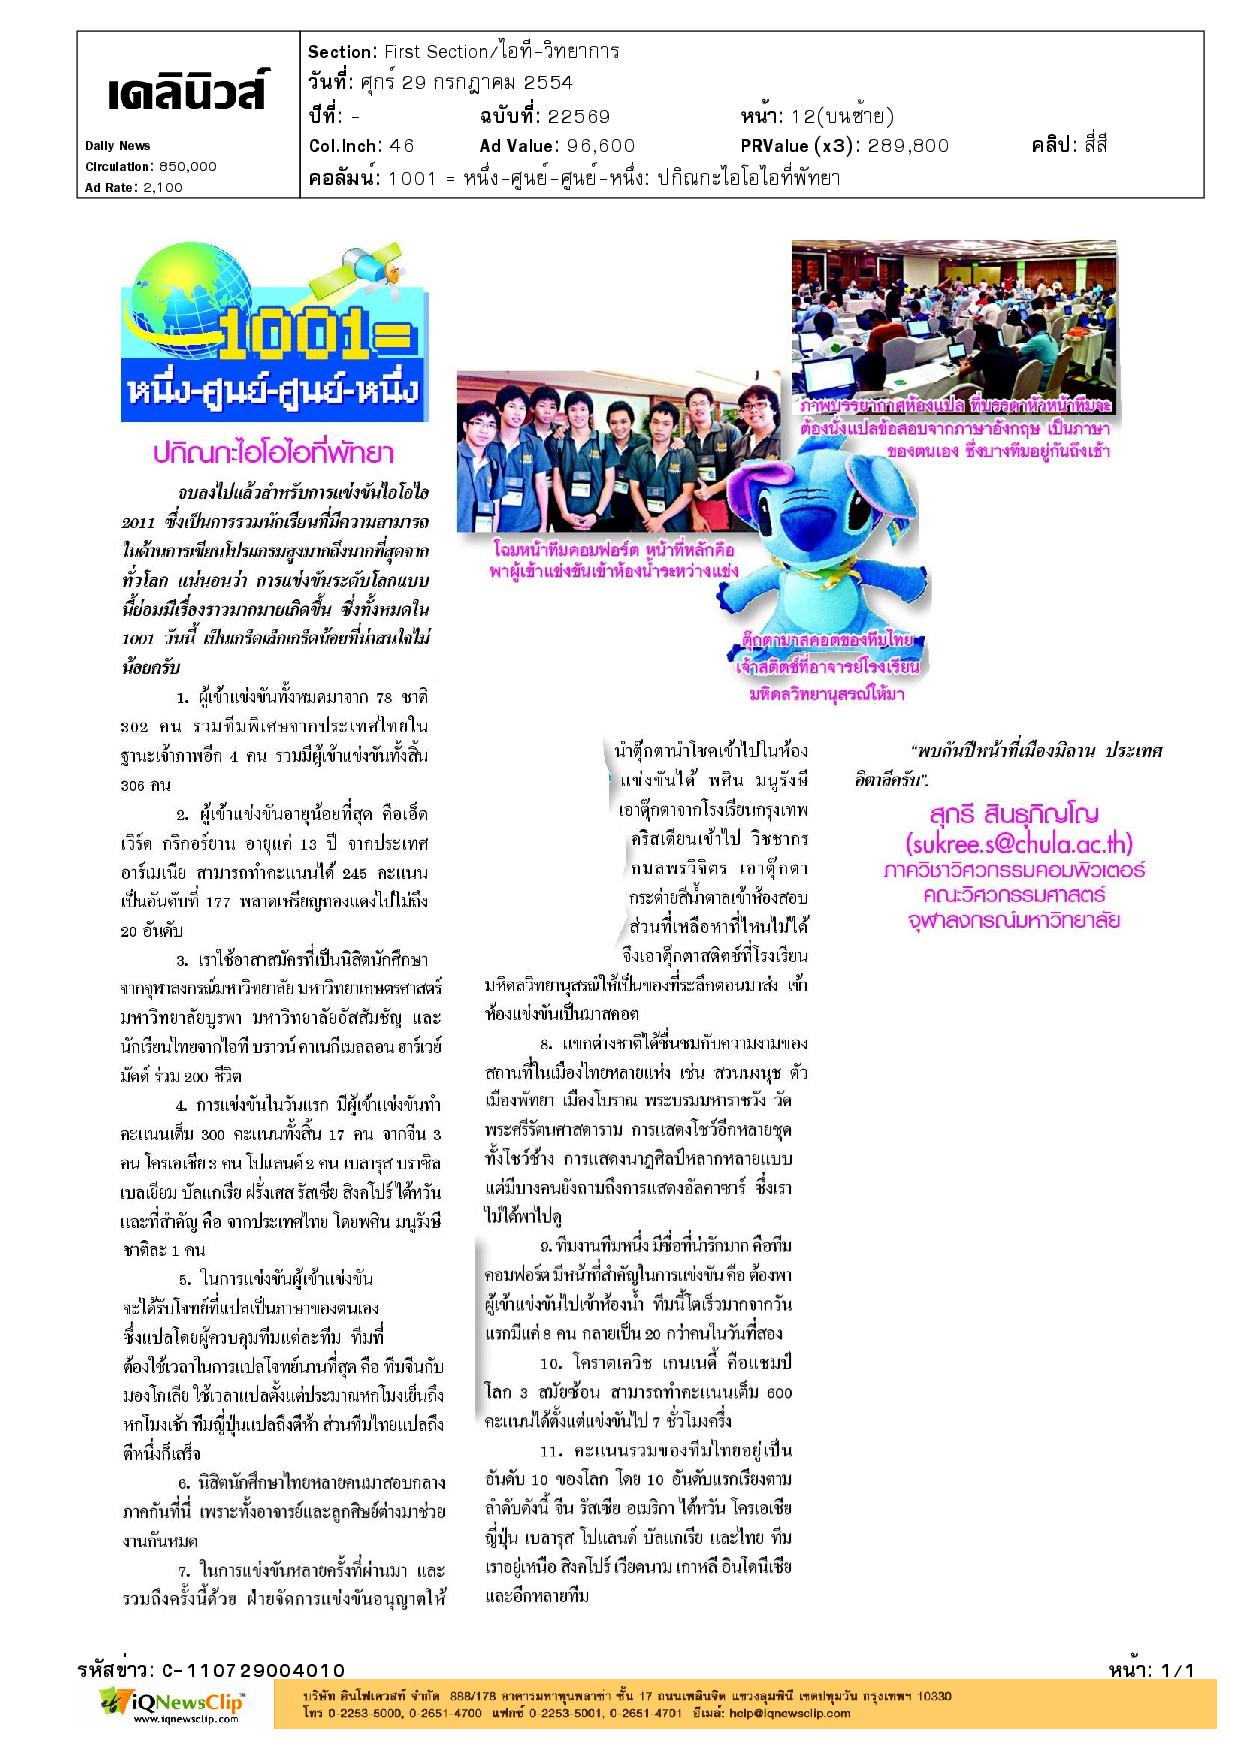 C-110729004010.pdf